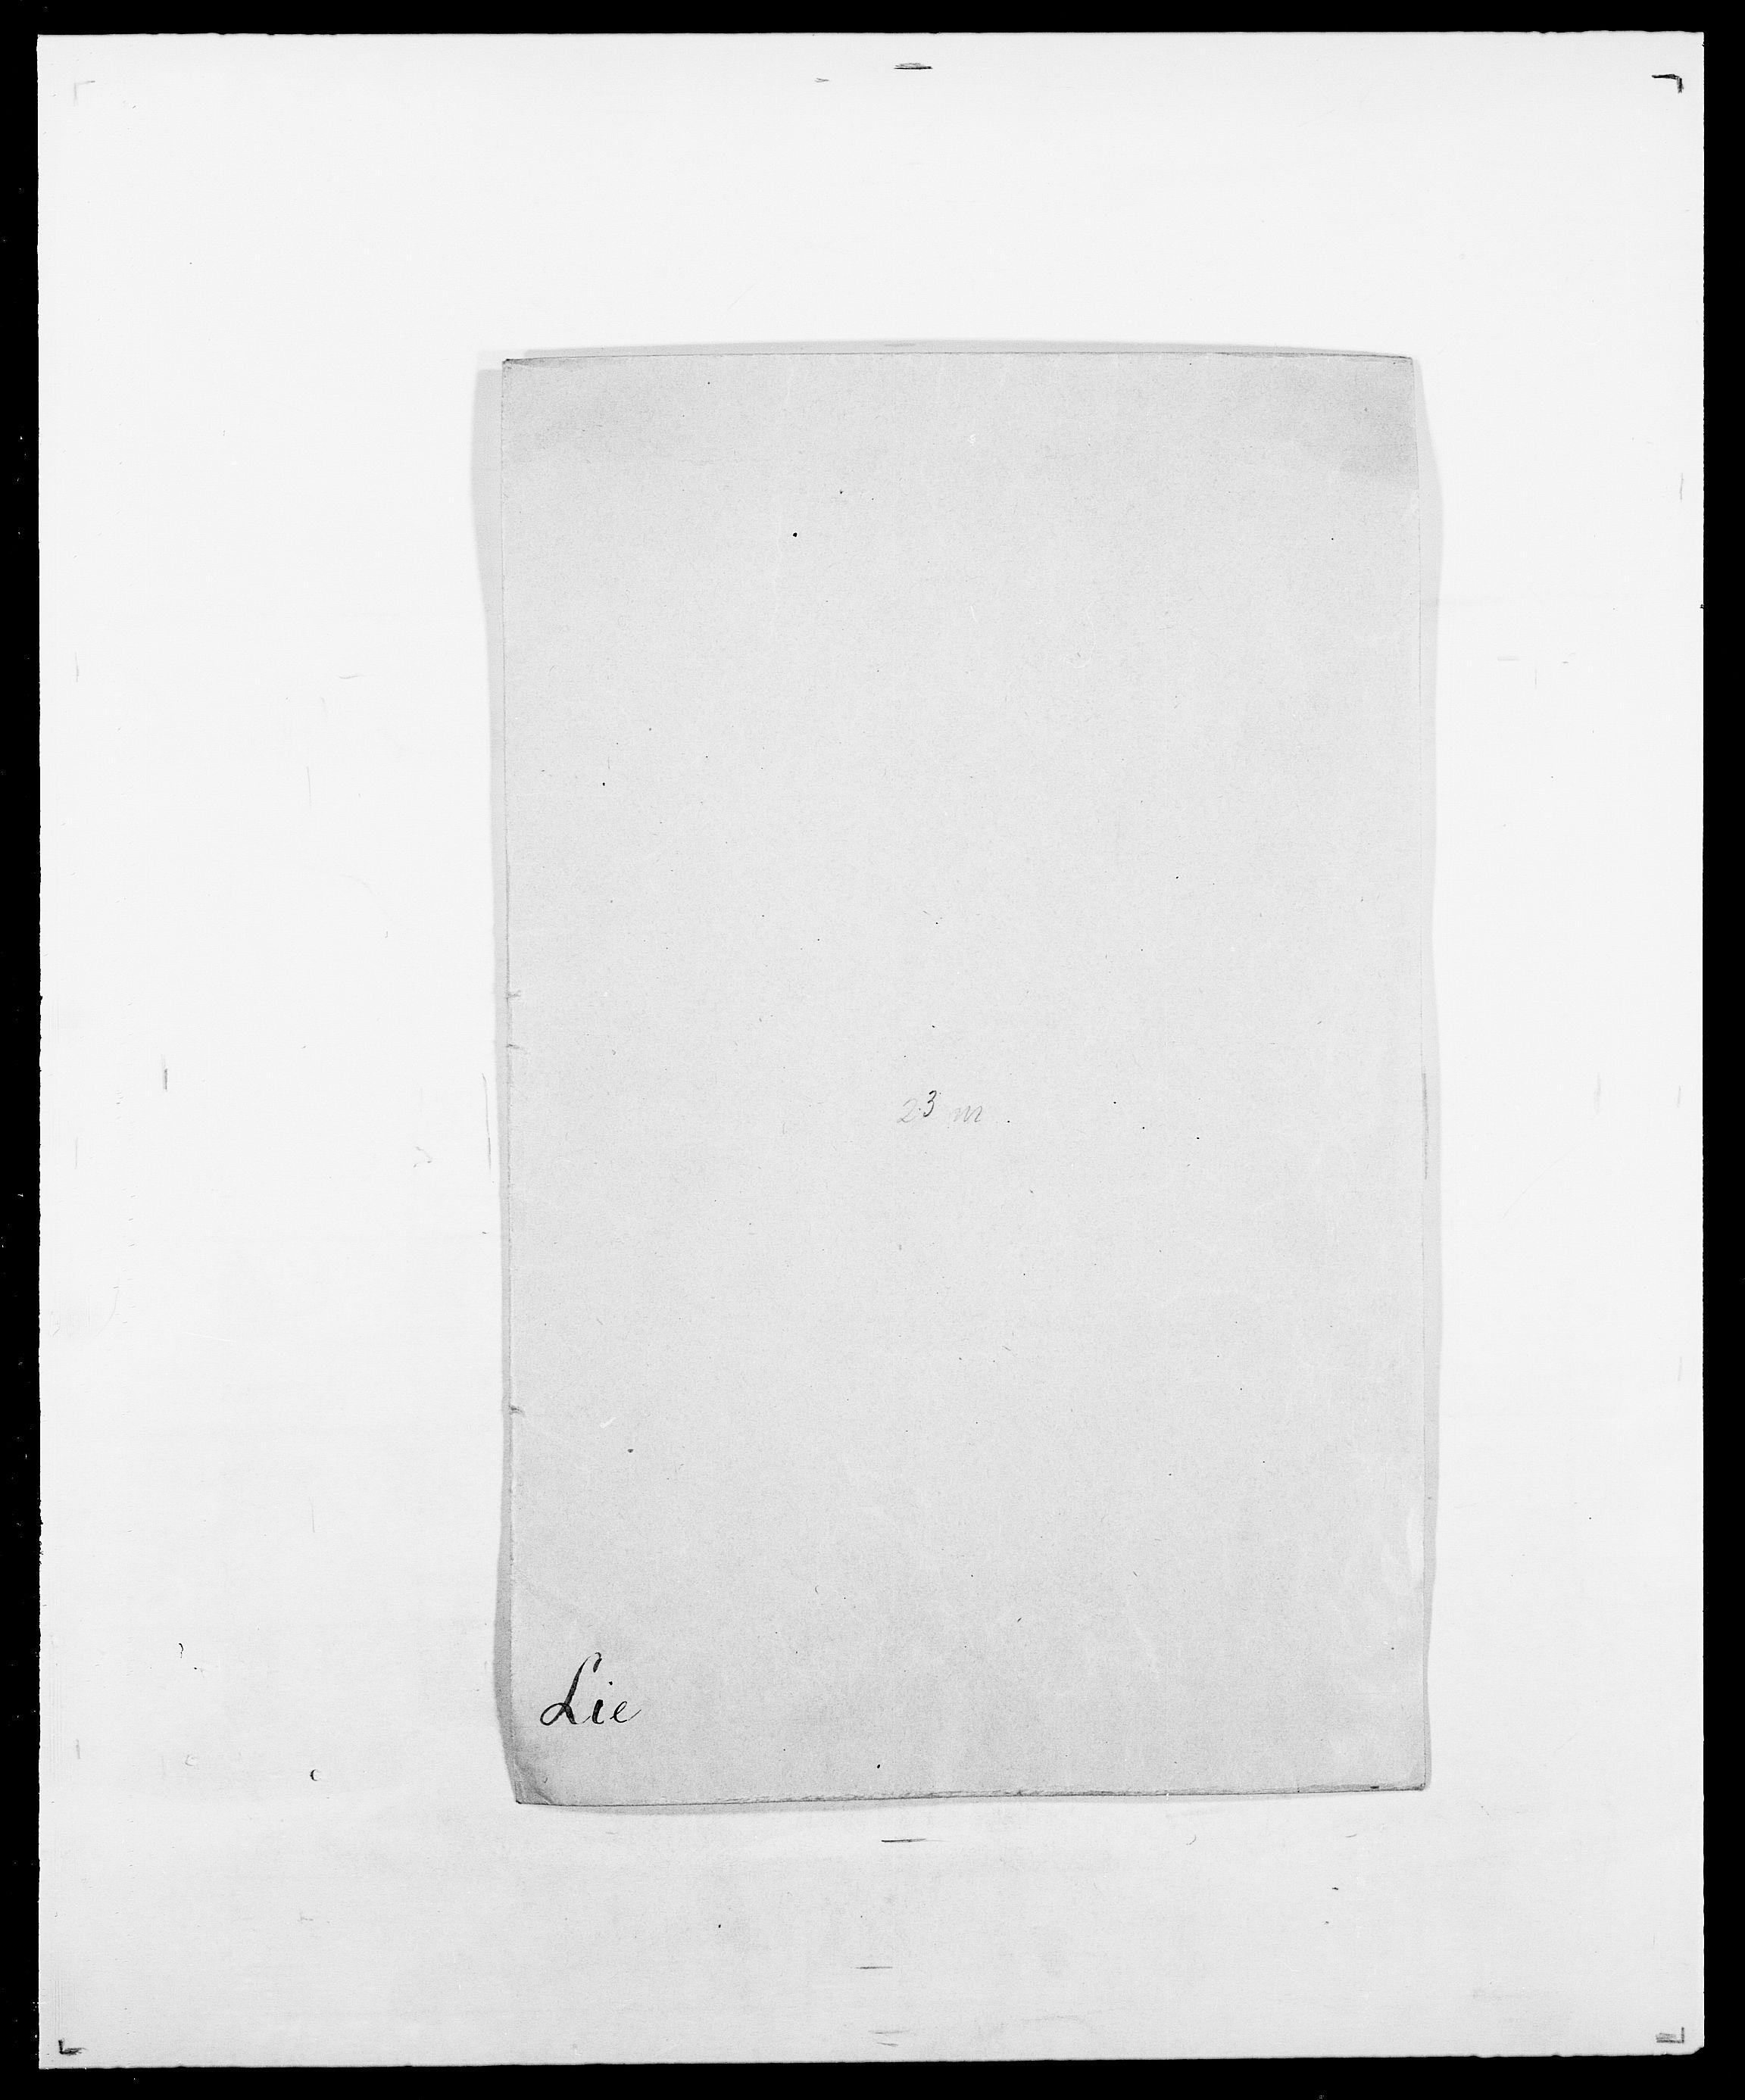 SAO, Delgobe, Charles Antoine - samling, D/Da/L0023: Lau - Lirvyn, s. 329